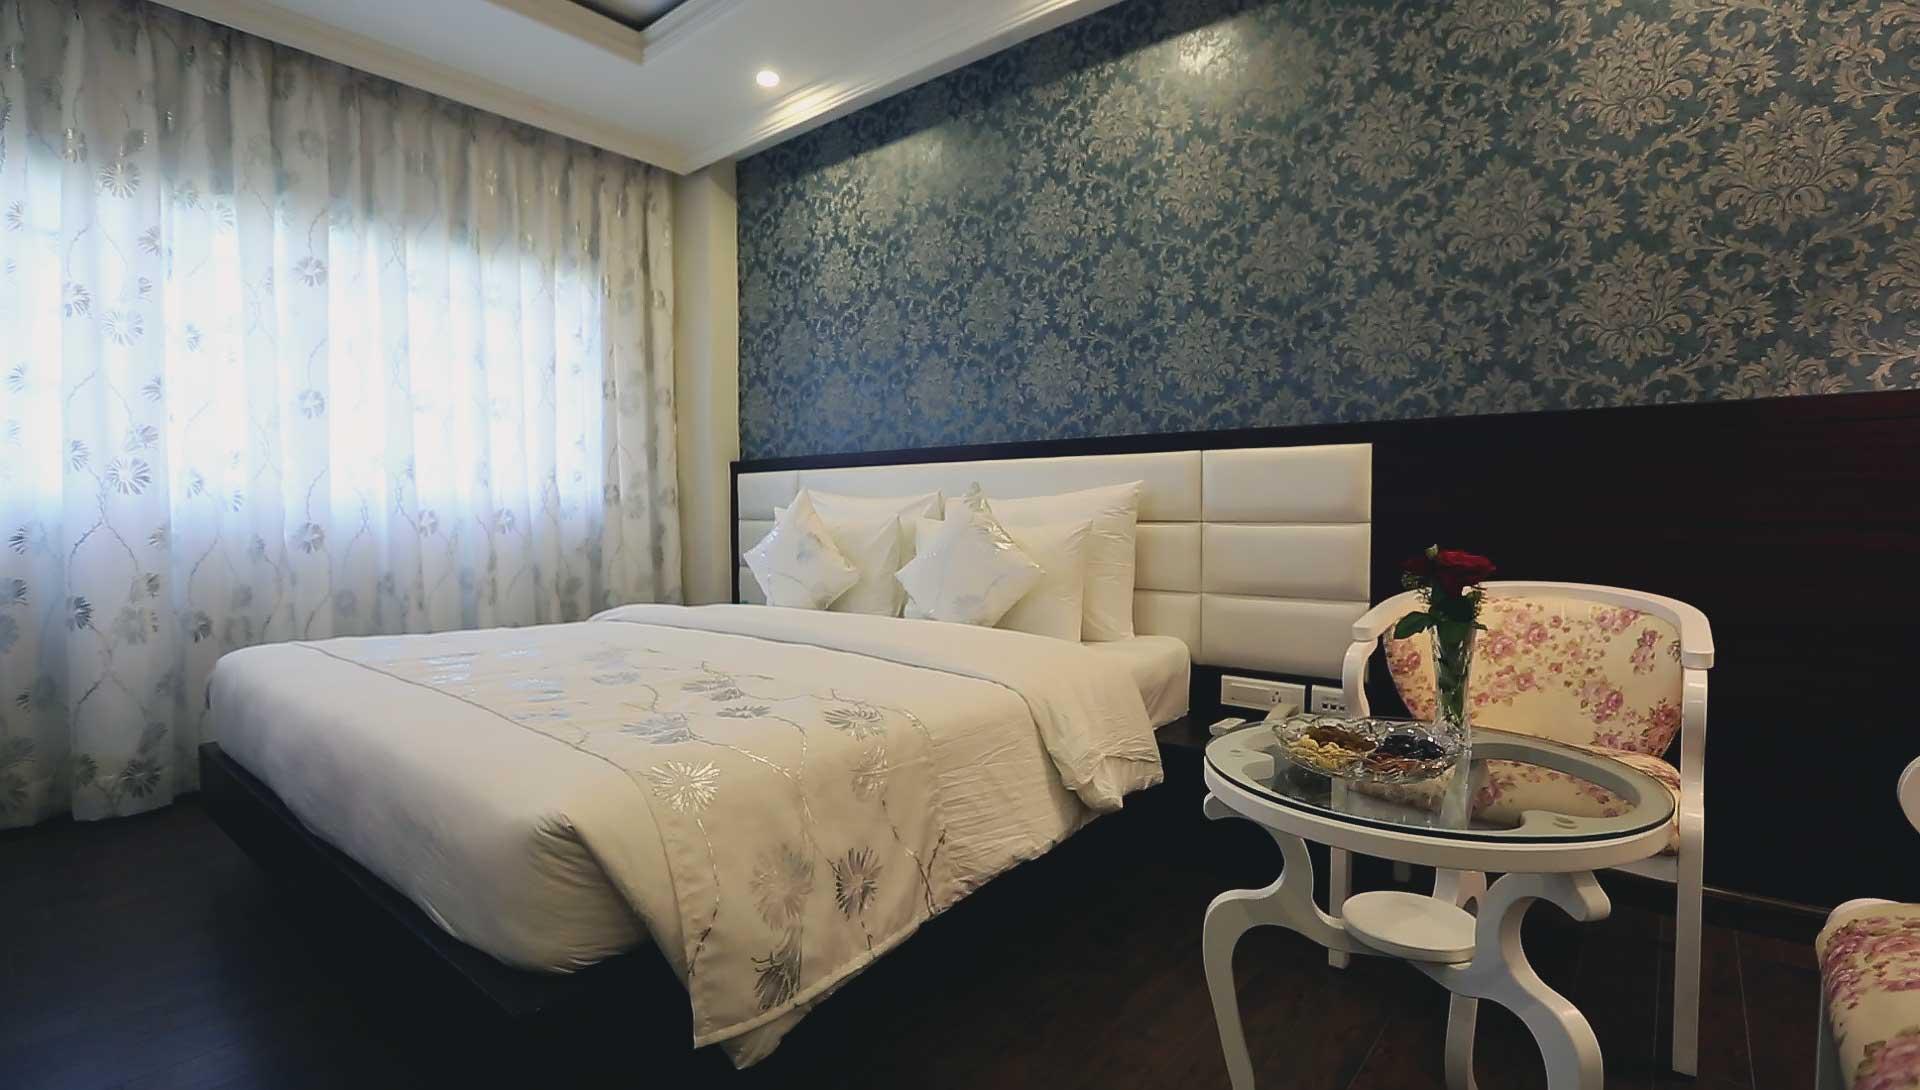 kiit hospitality Rooms photo